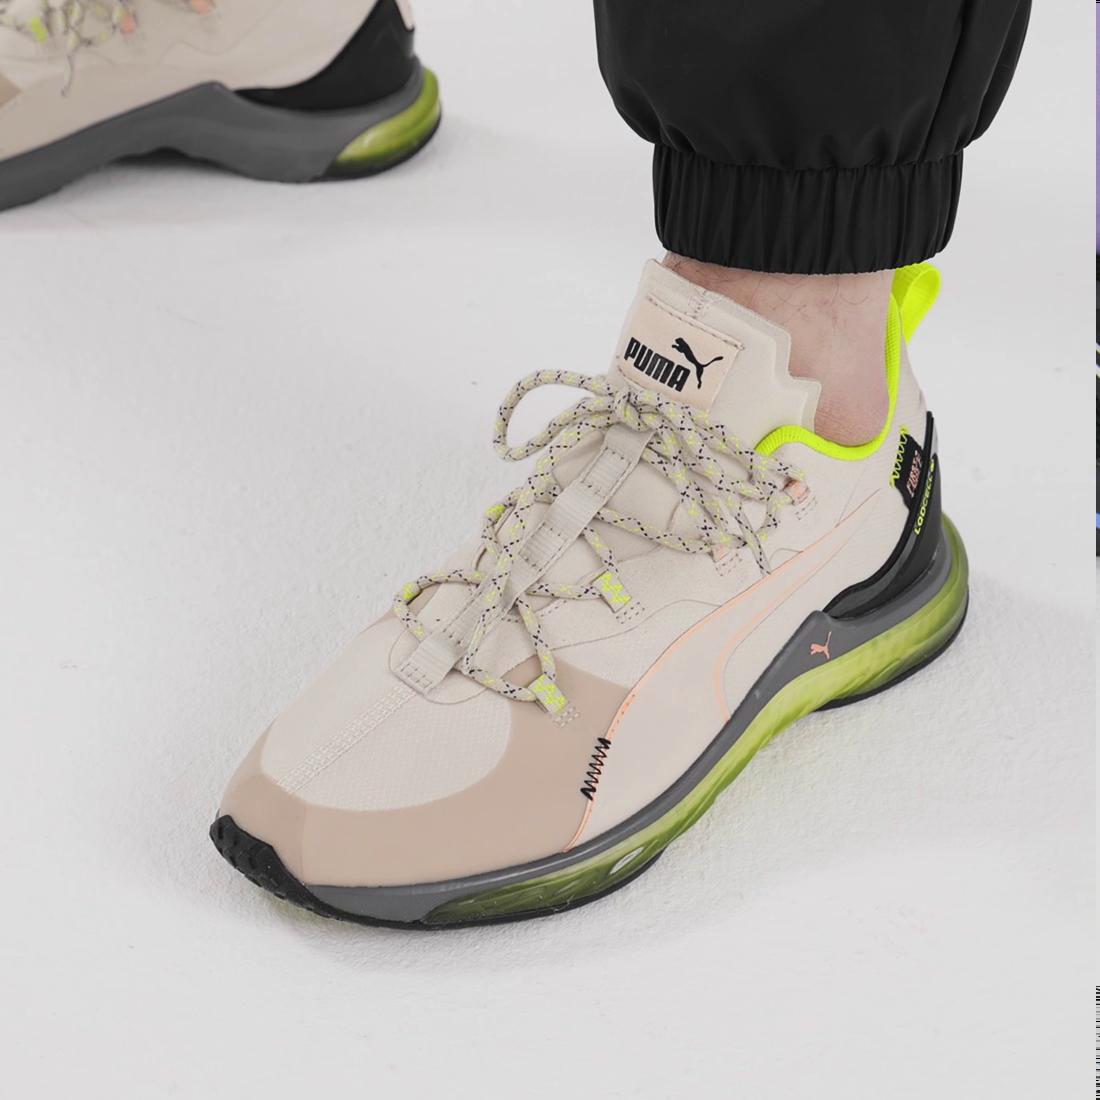 Image PUMA LQDCELL Hydra FM Women's Training Shoes #8